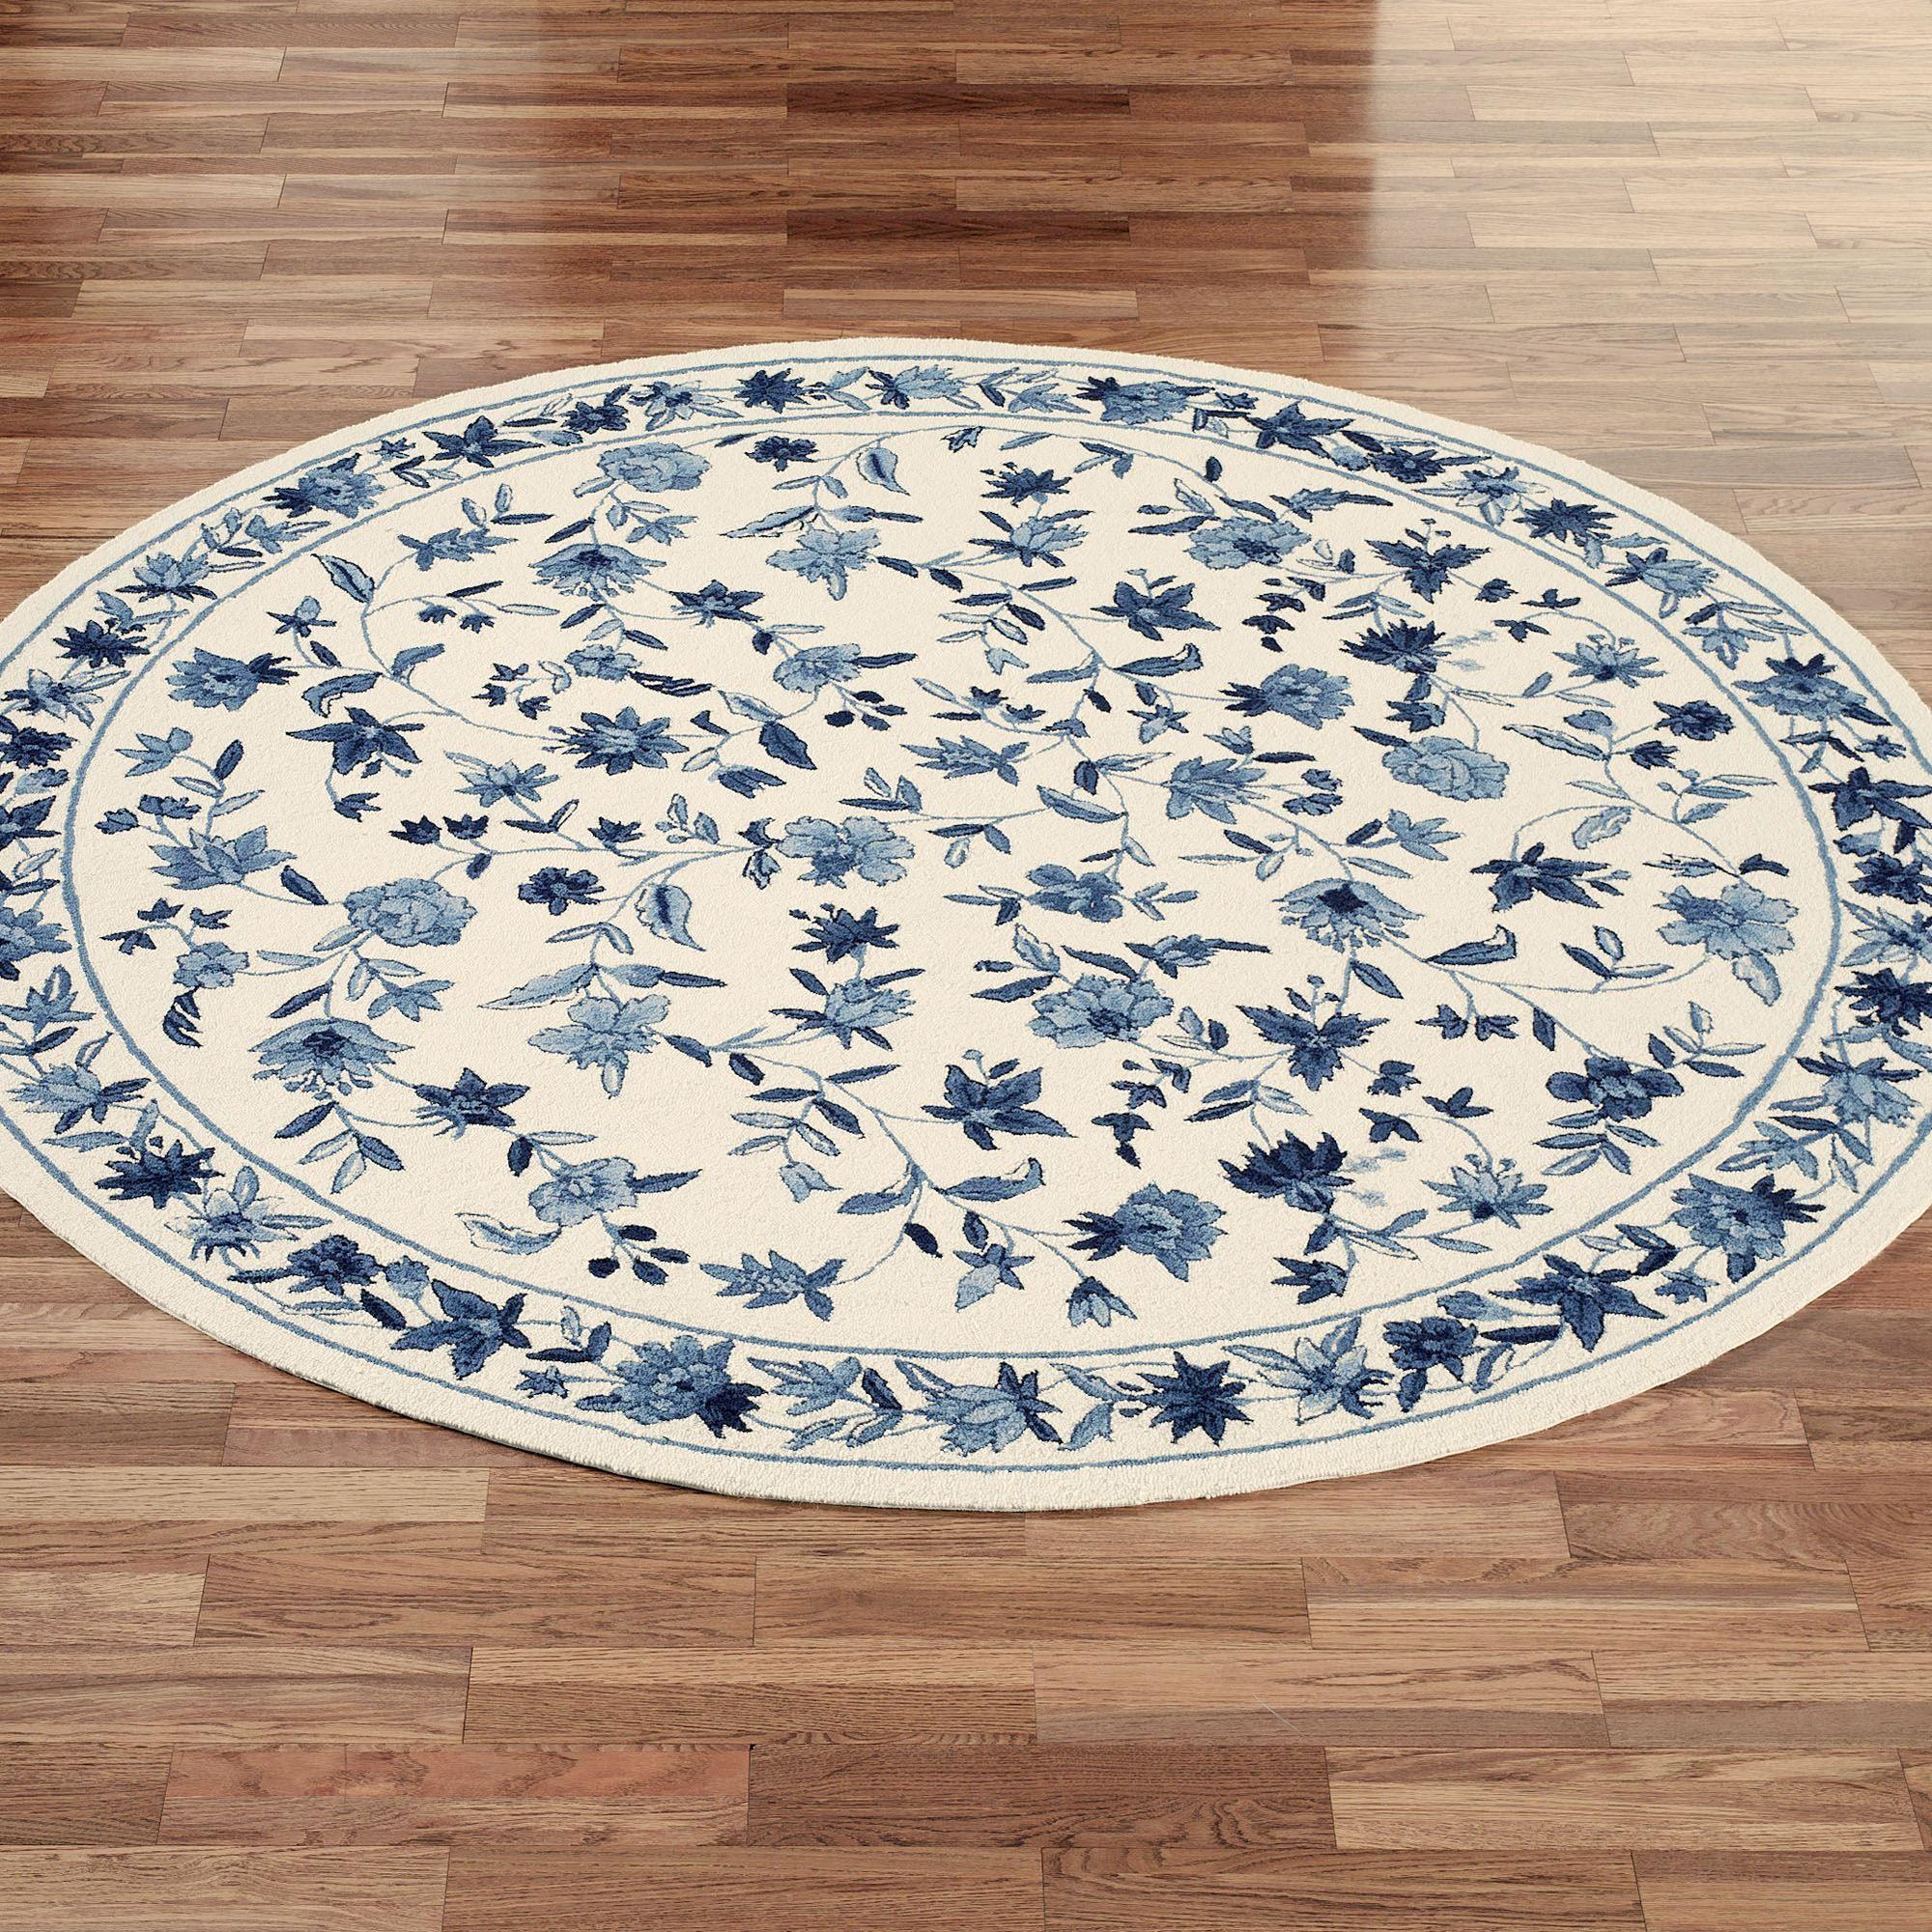 rugs geometric of size black white and leather room bathroom blue green grey flokati large plush wonderful ivory western gold dining shag bonnie for orange rug area